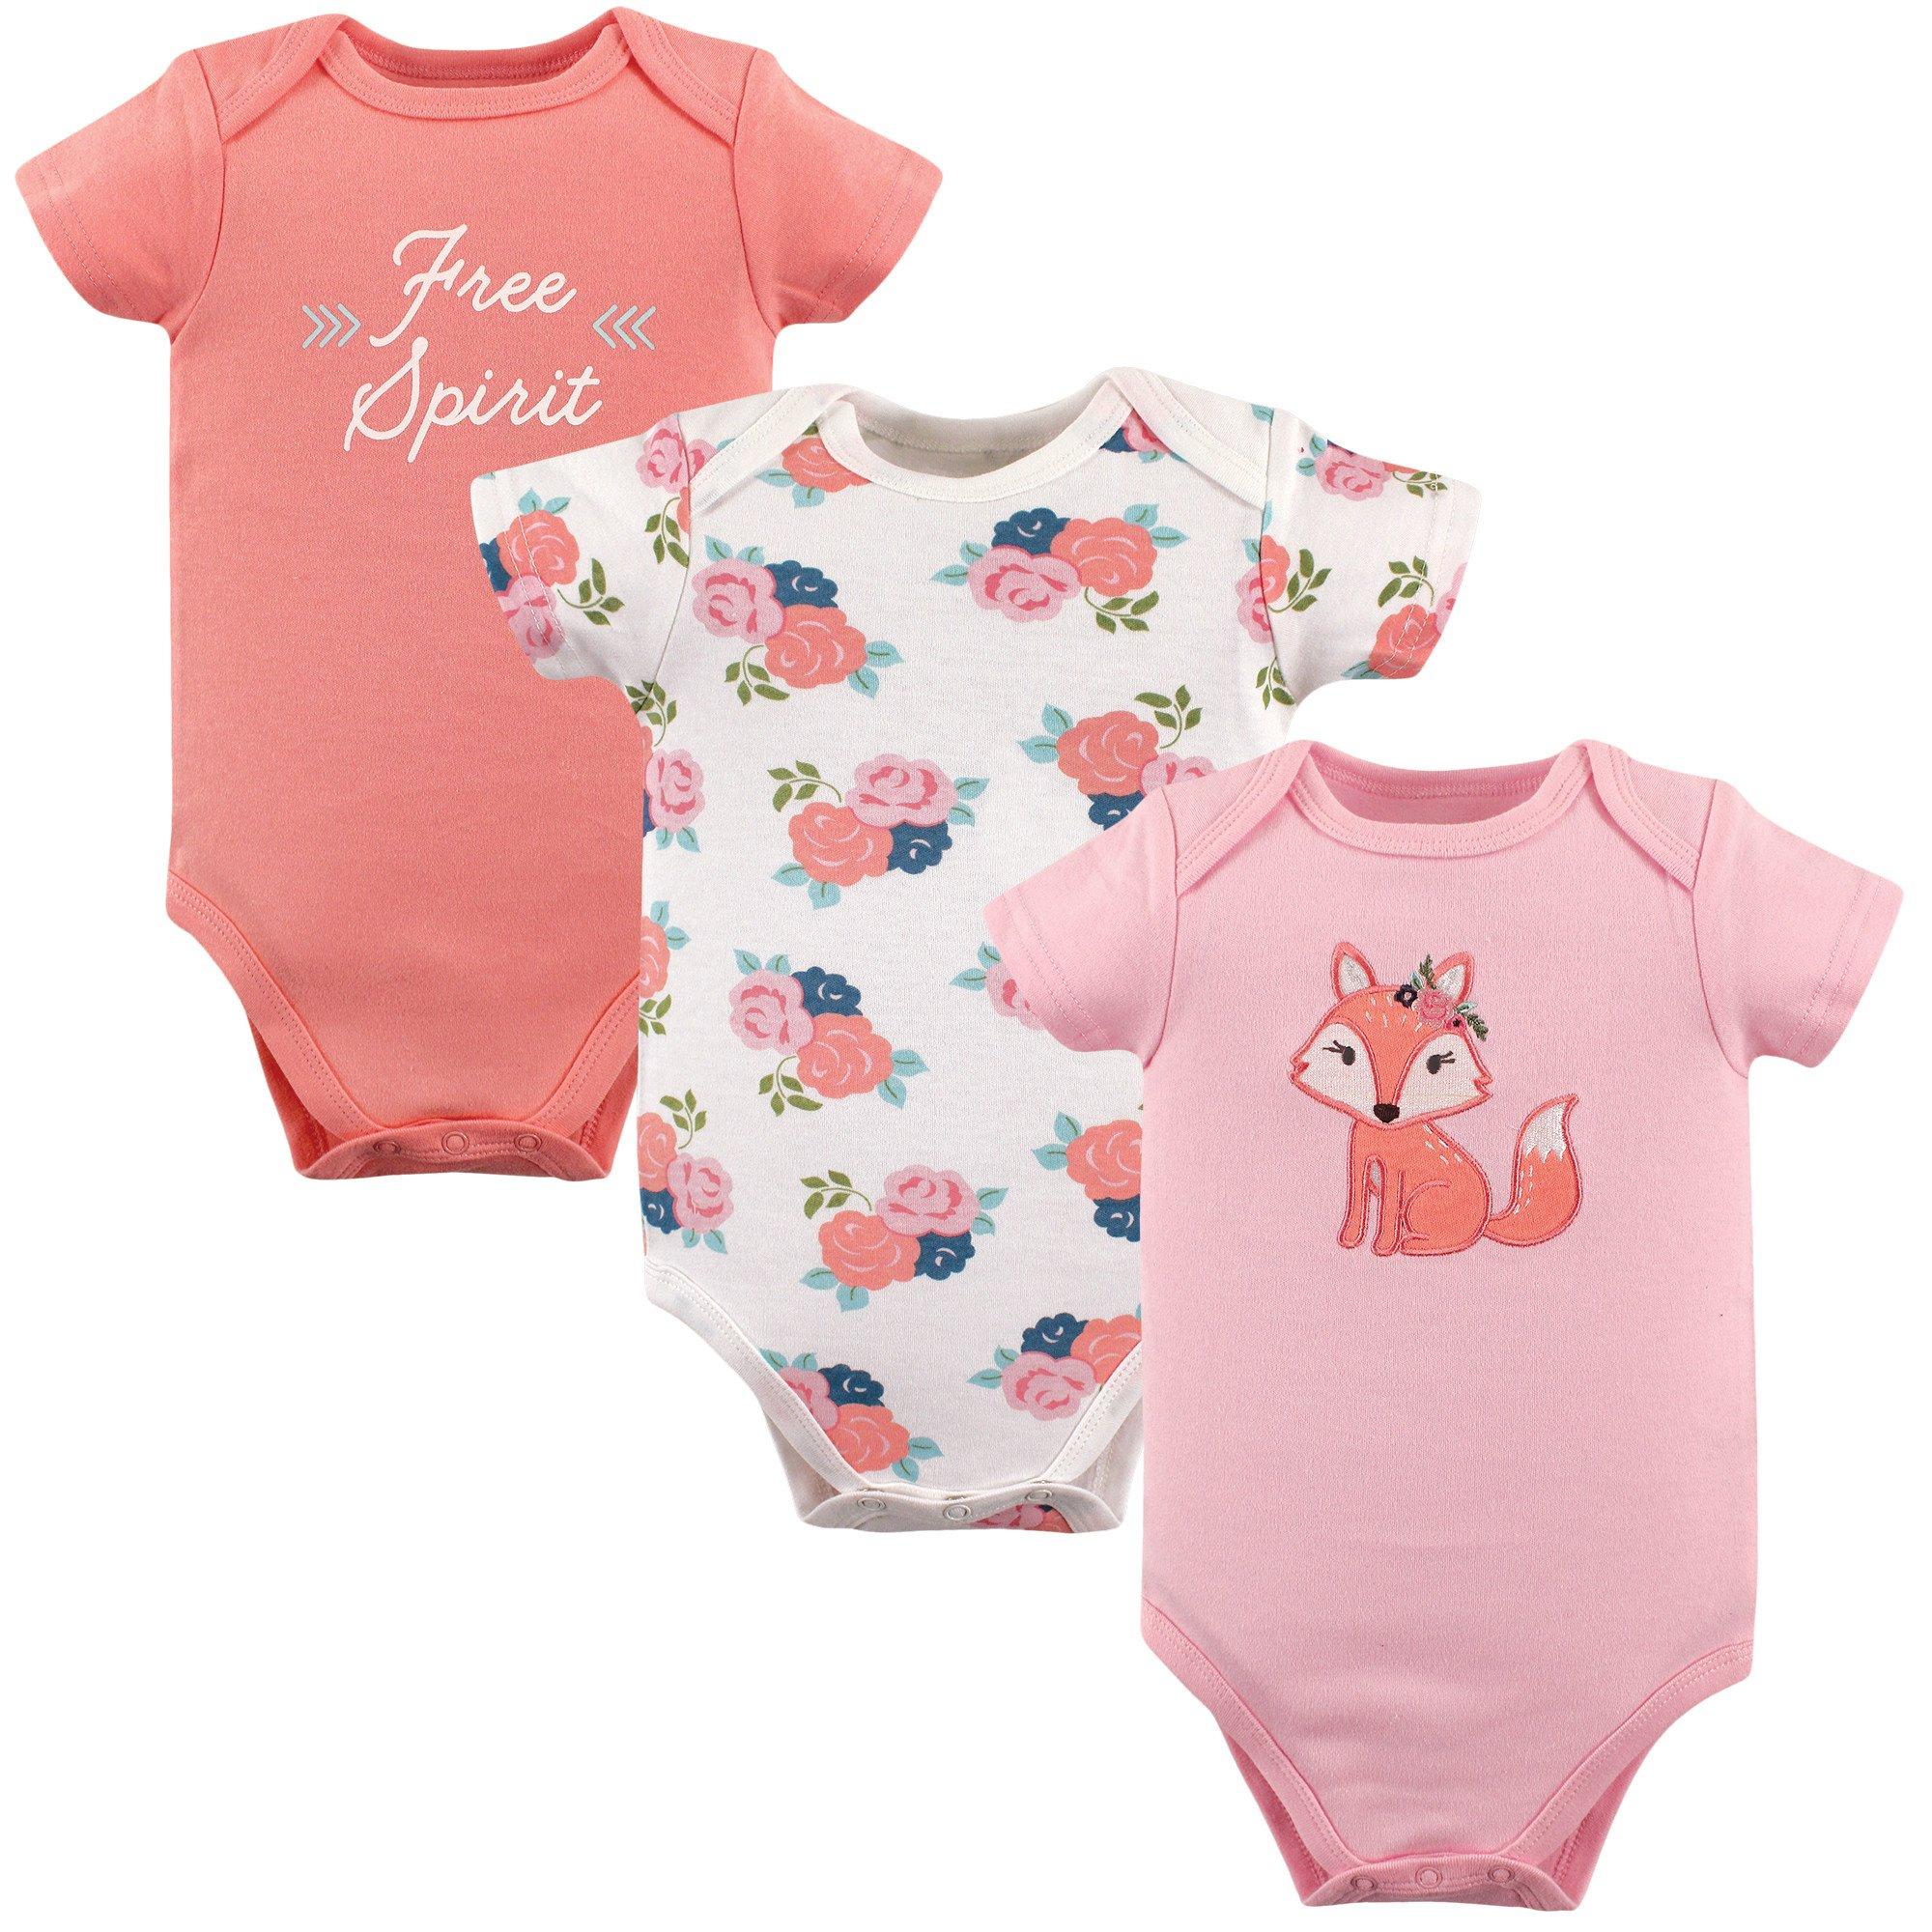 Hudson Baby Baby Infant Cotton Bodysuits Free Spirit 3 Pack 6 9